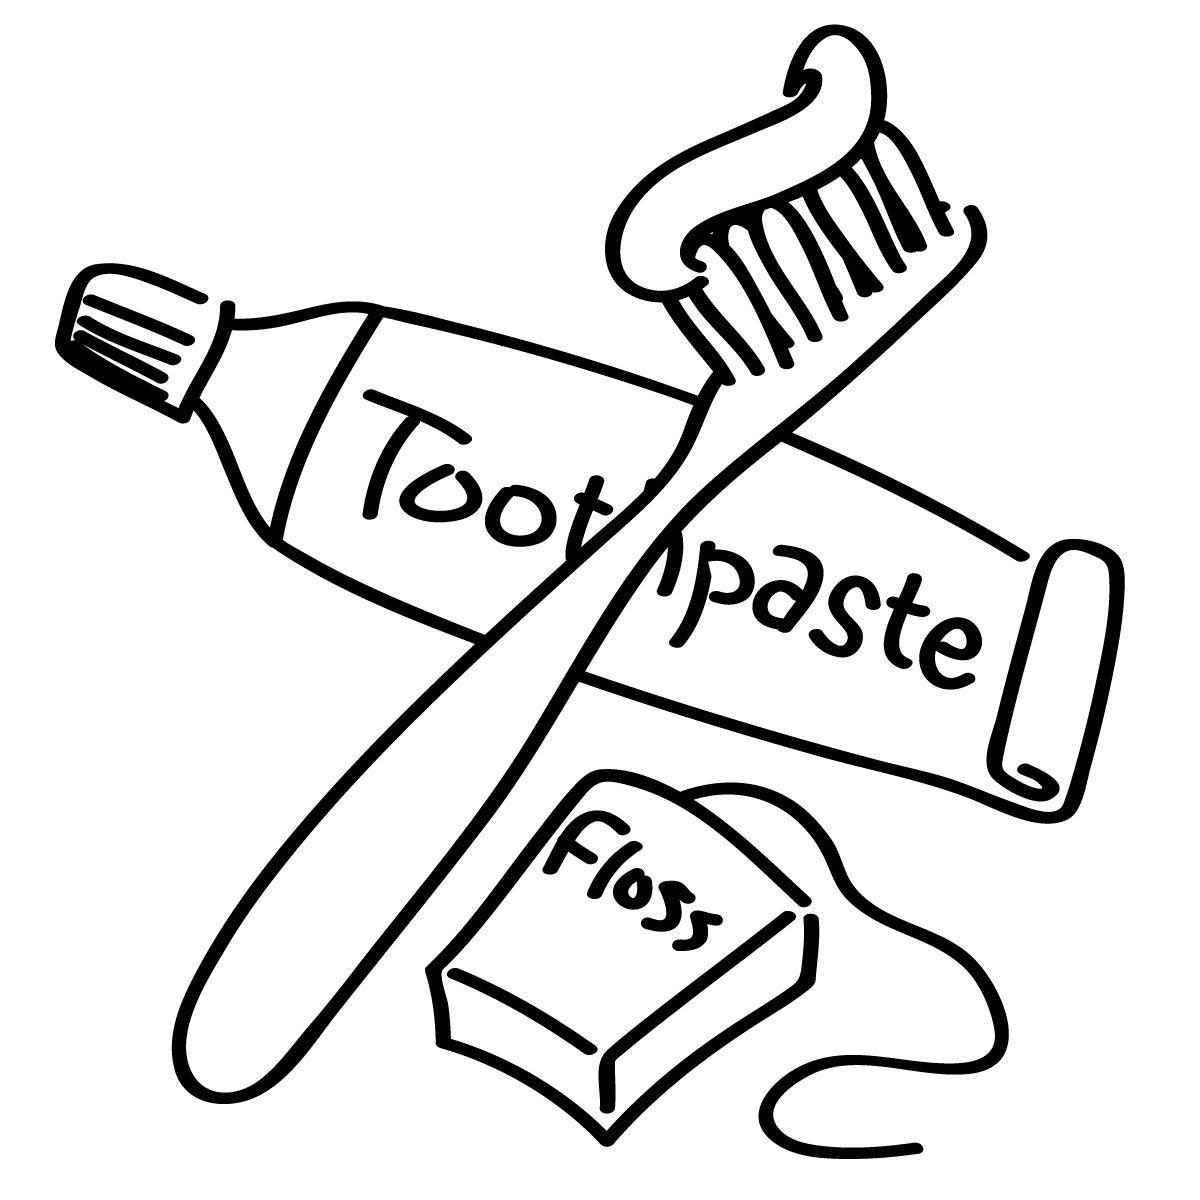 1200x1200 Dental Hygiene Coloring Pages For Kids Resume Samples